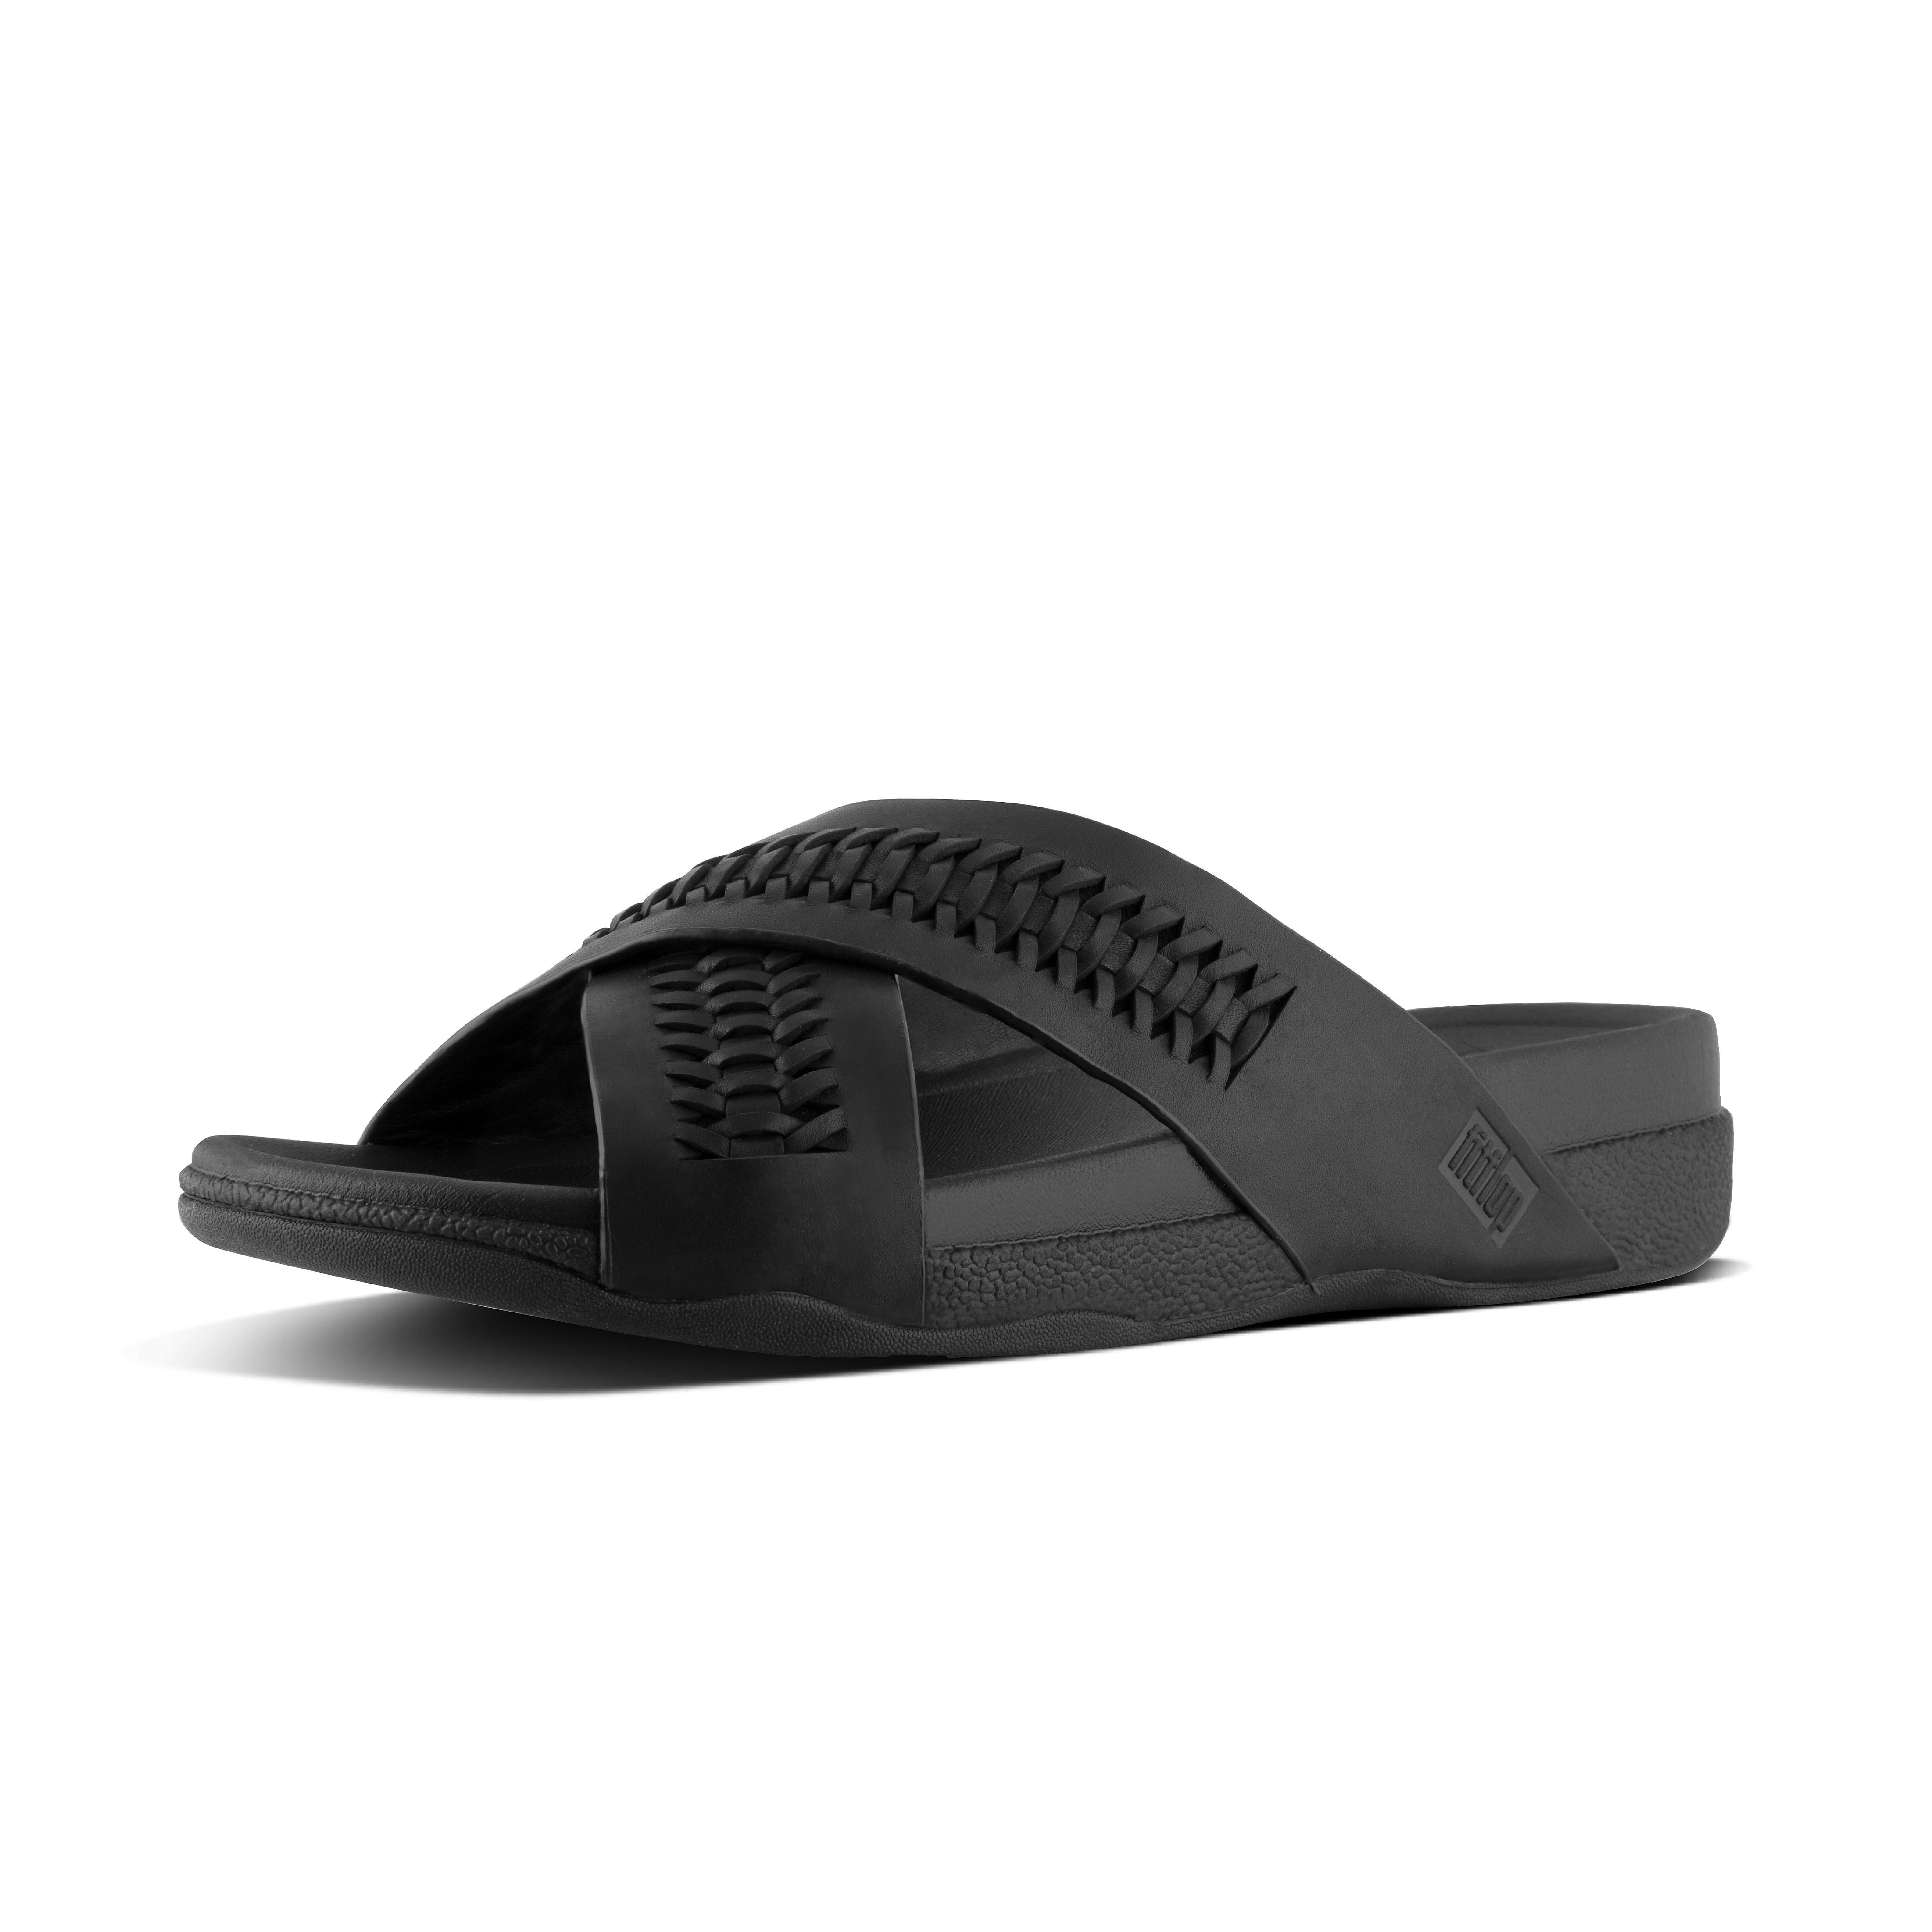 7686c44c1459 Lyst - Fitflop Surfer in Black for Men